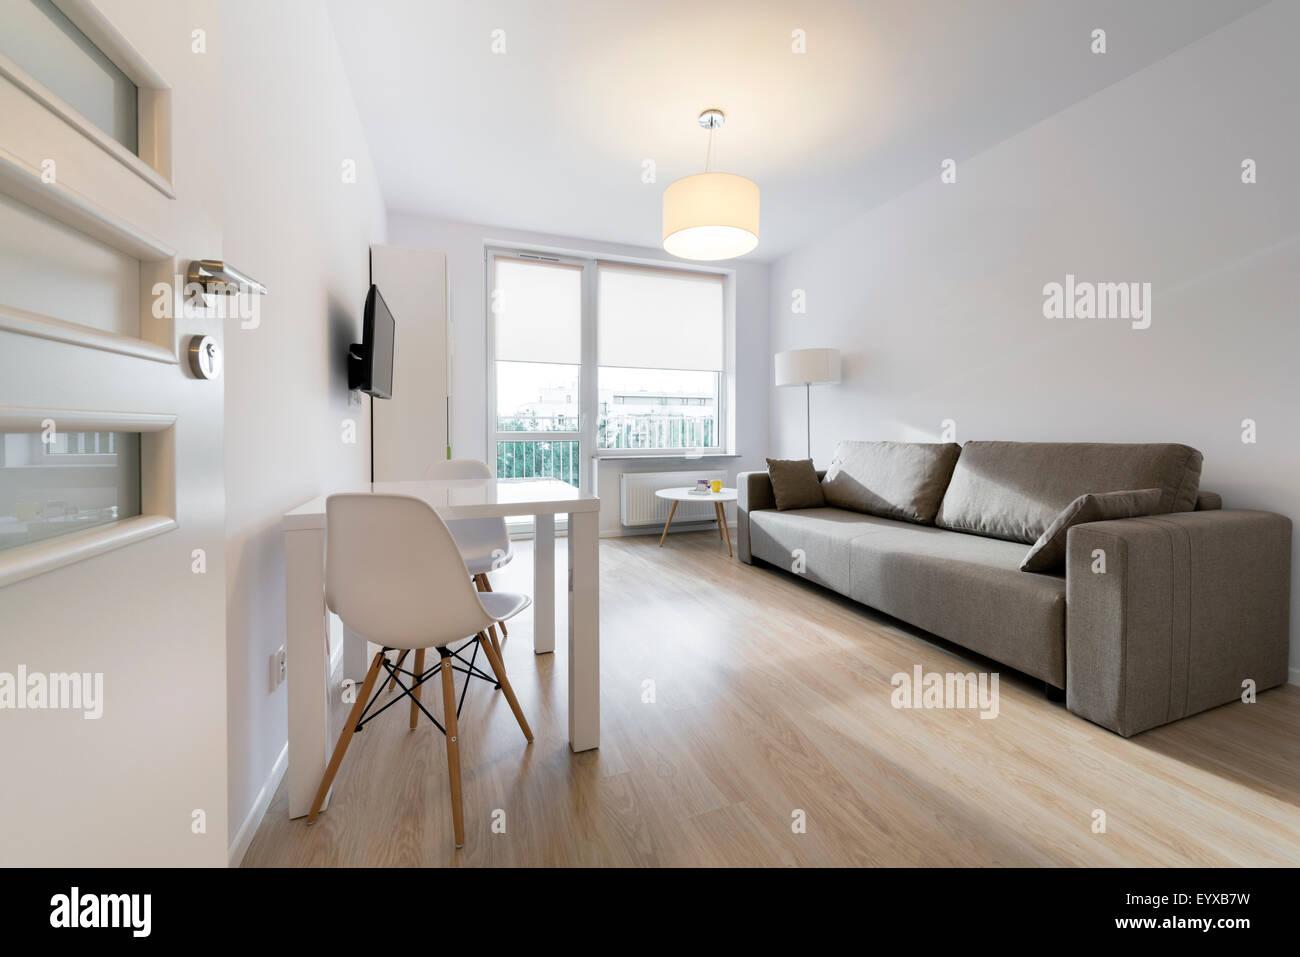 Compact  modern sleeping room interior design. Compact  Modern Sleeping Room Interior Design Stock Photo  Royalty